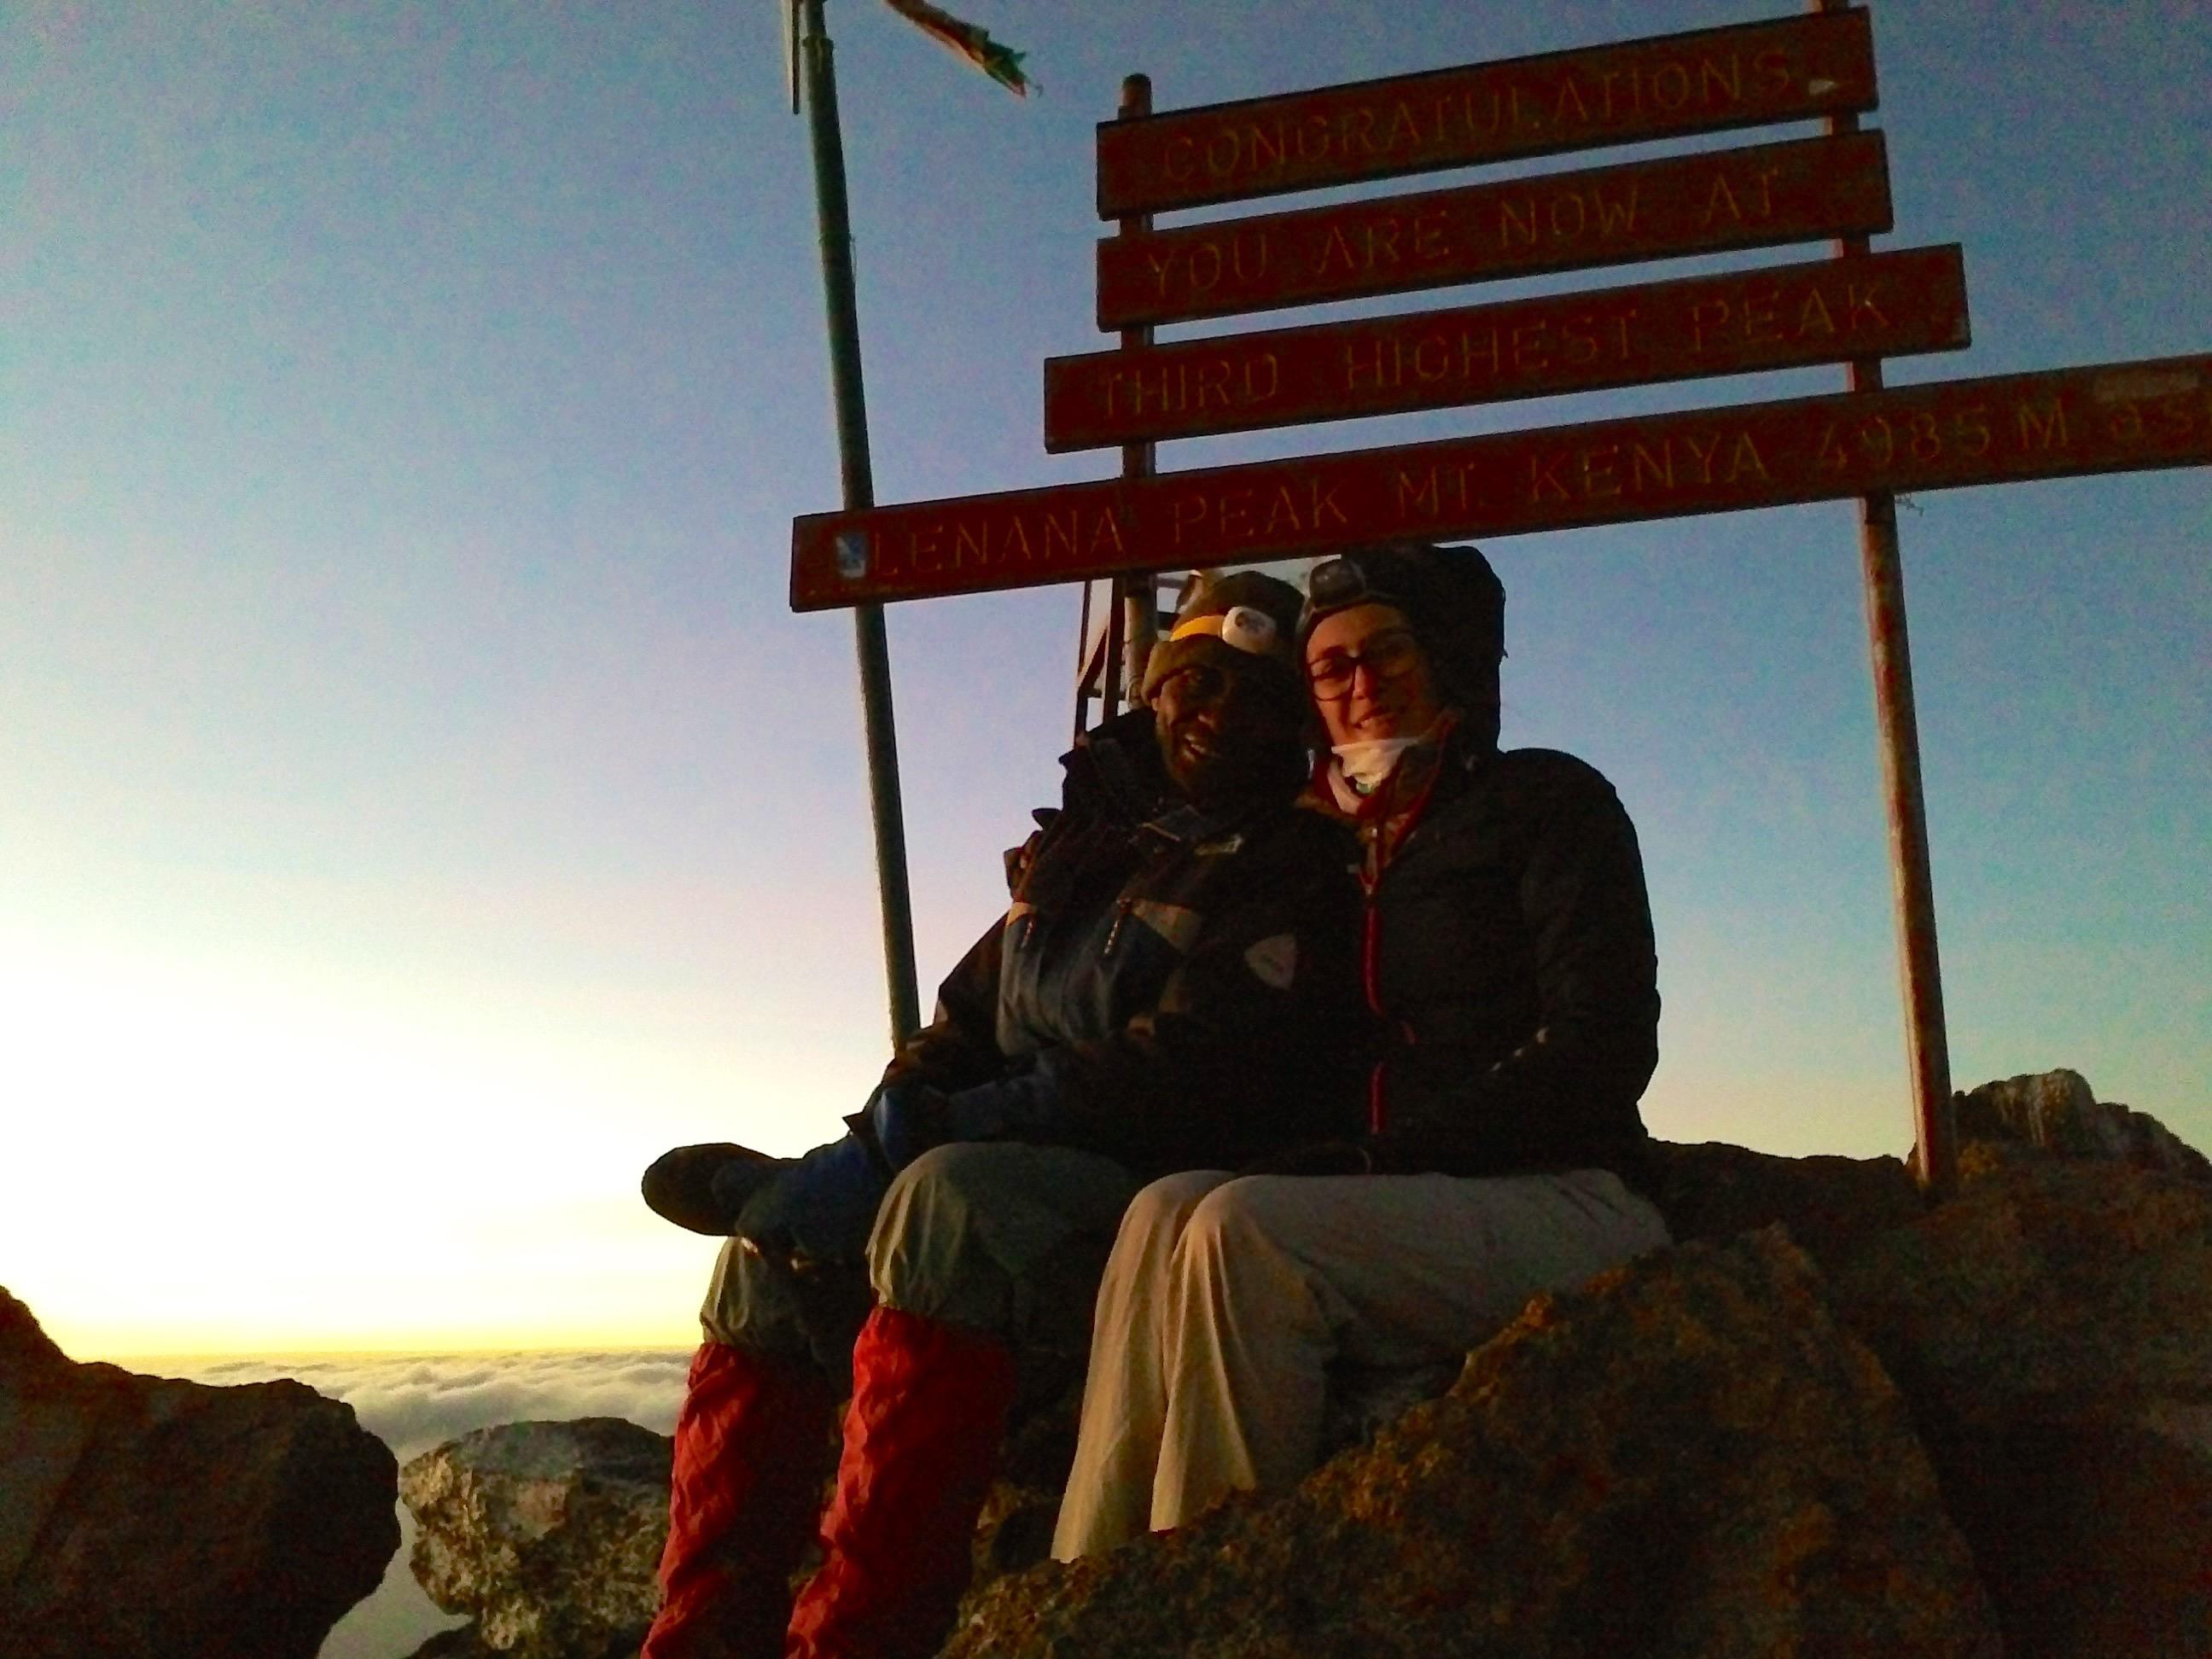 Arrivés au sommet du Mont Kenya – 4985m